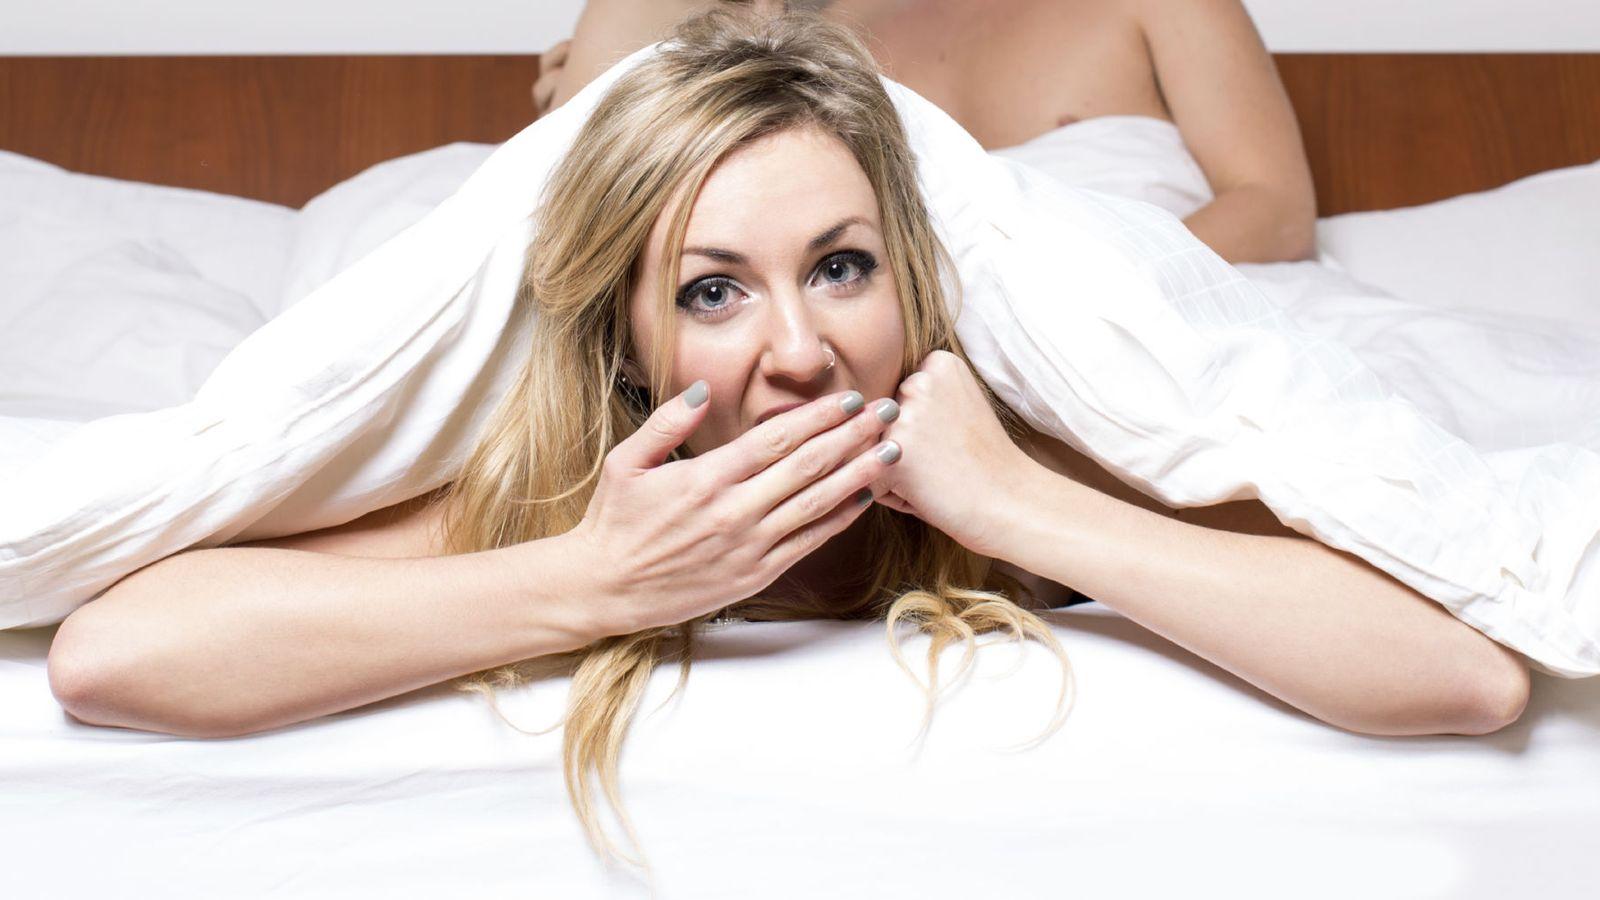 Mujeres normales para encuentros ocasionales [PUNIQRANDLINE-(au-dating-names.txt) 70